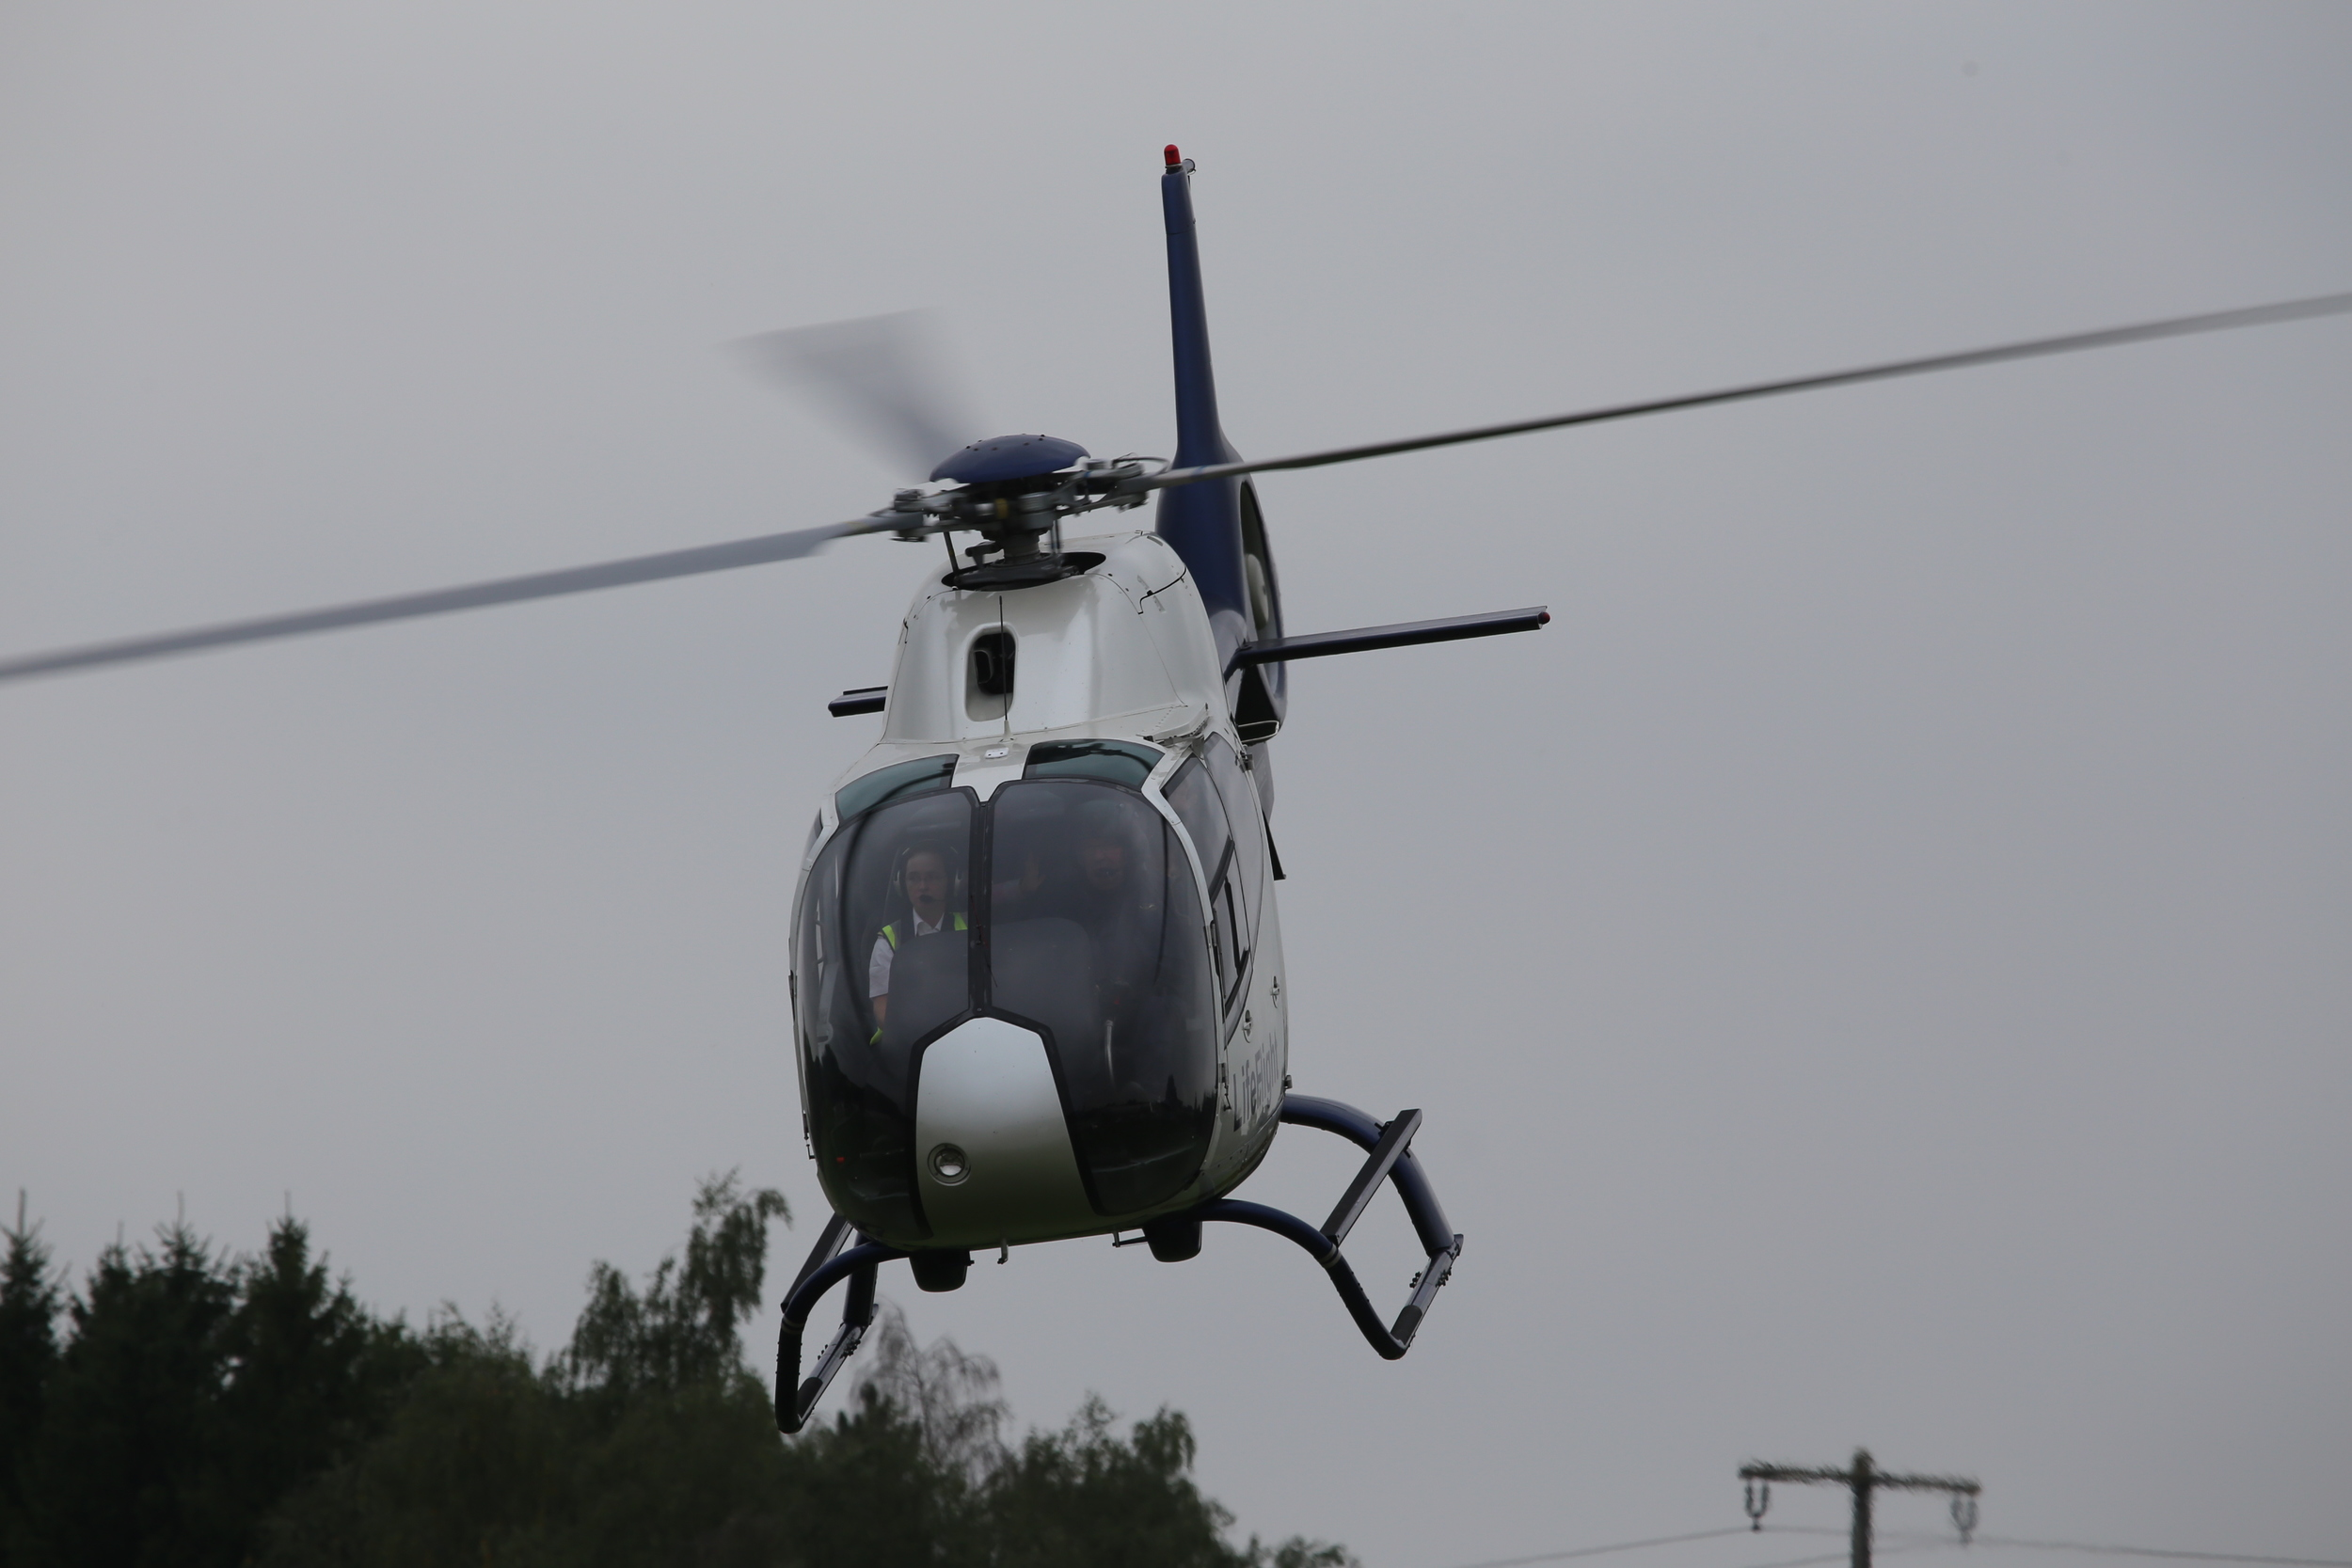 """Helicraft 26, departing Wadersloh heliport .."""